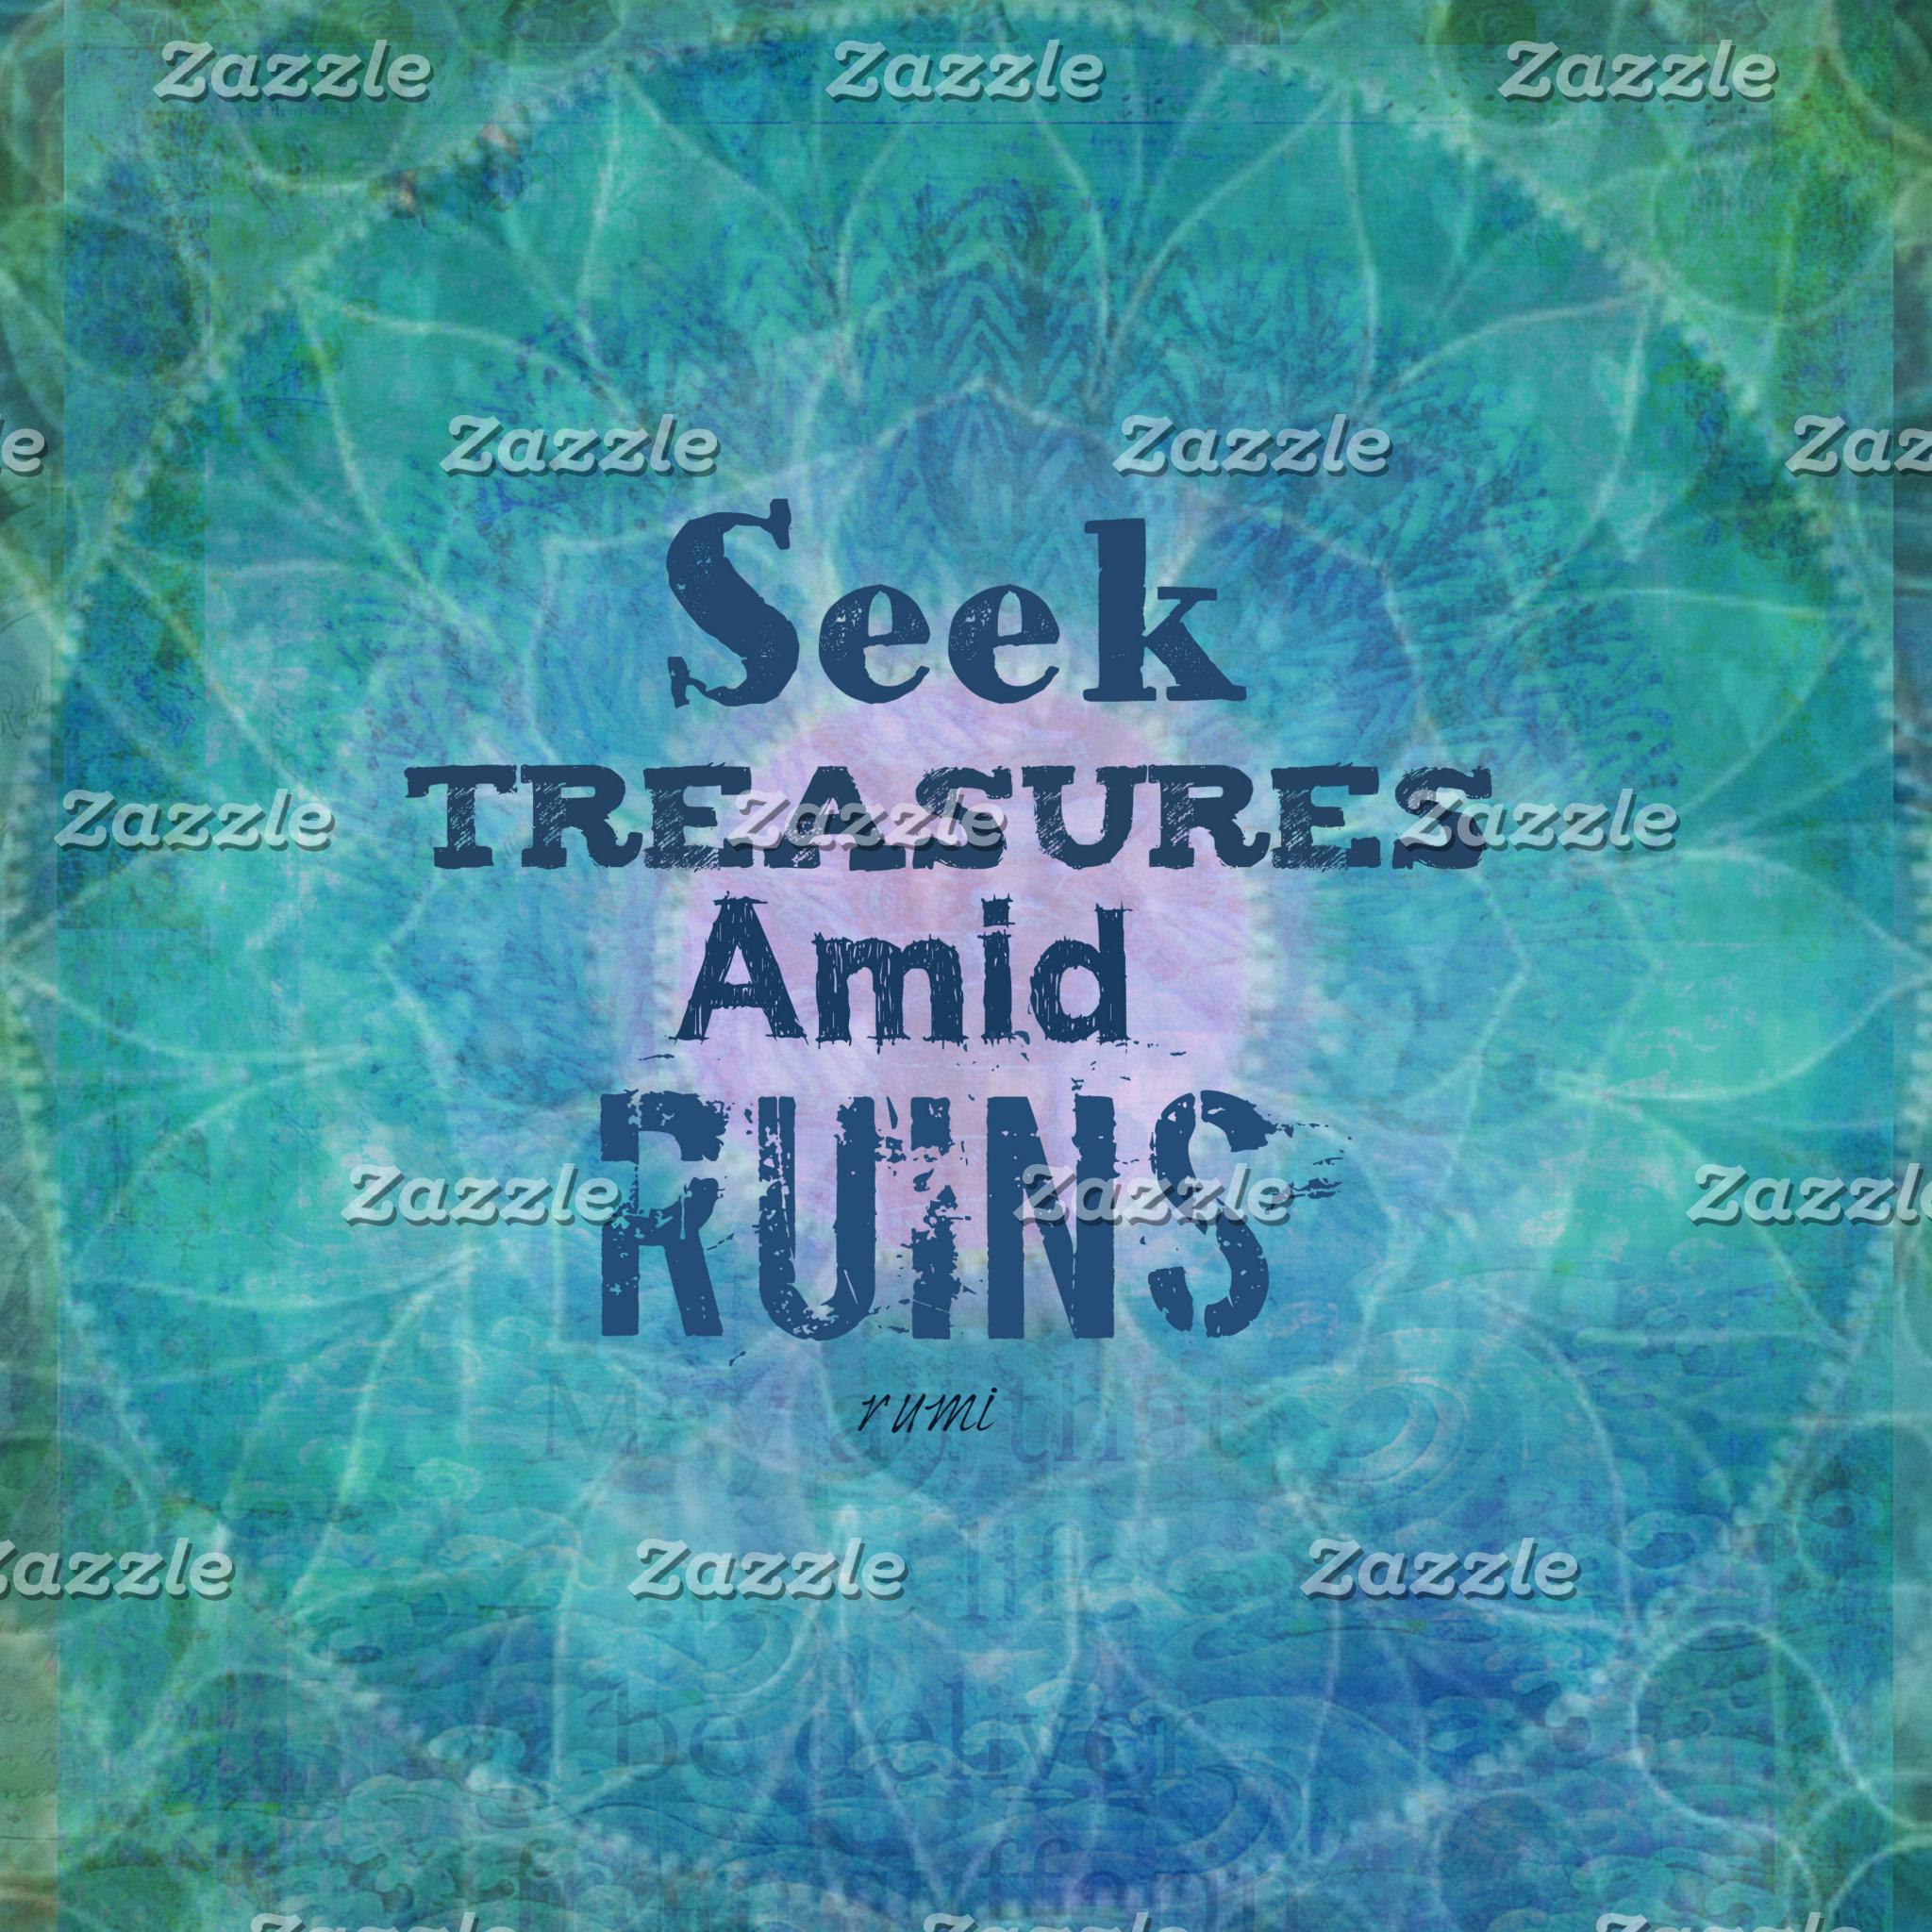 Seek Treasures Amid Ruins Rumi quote